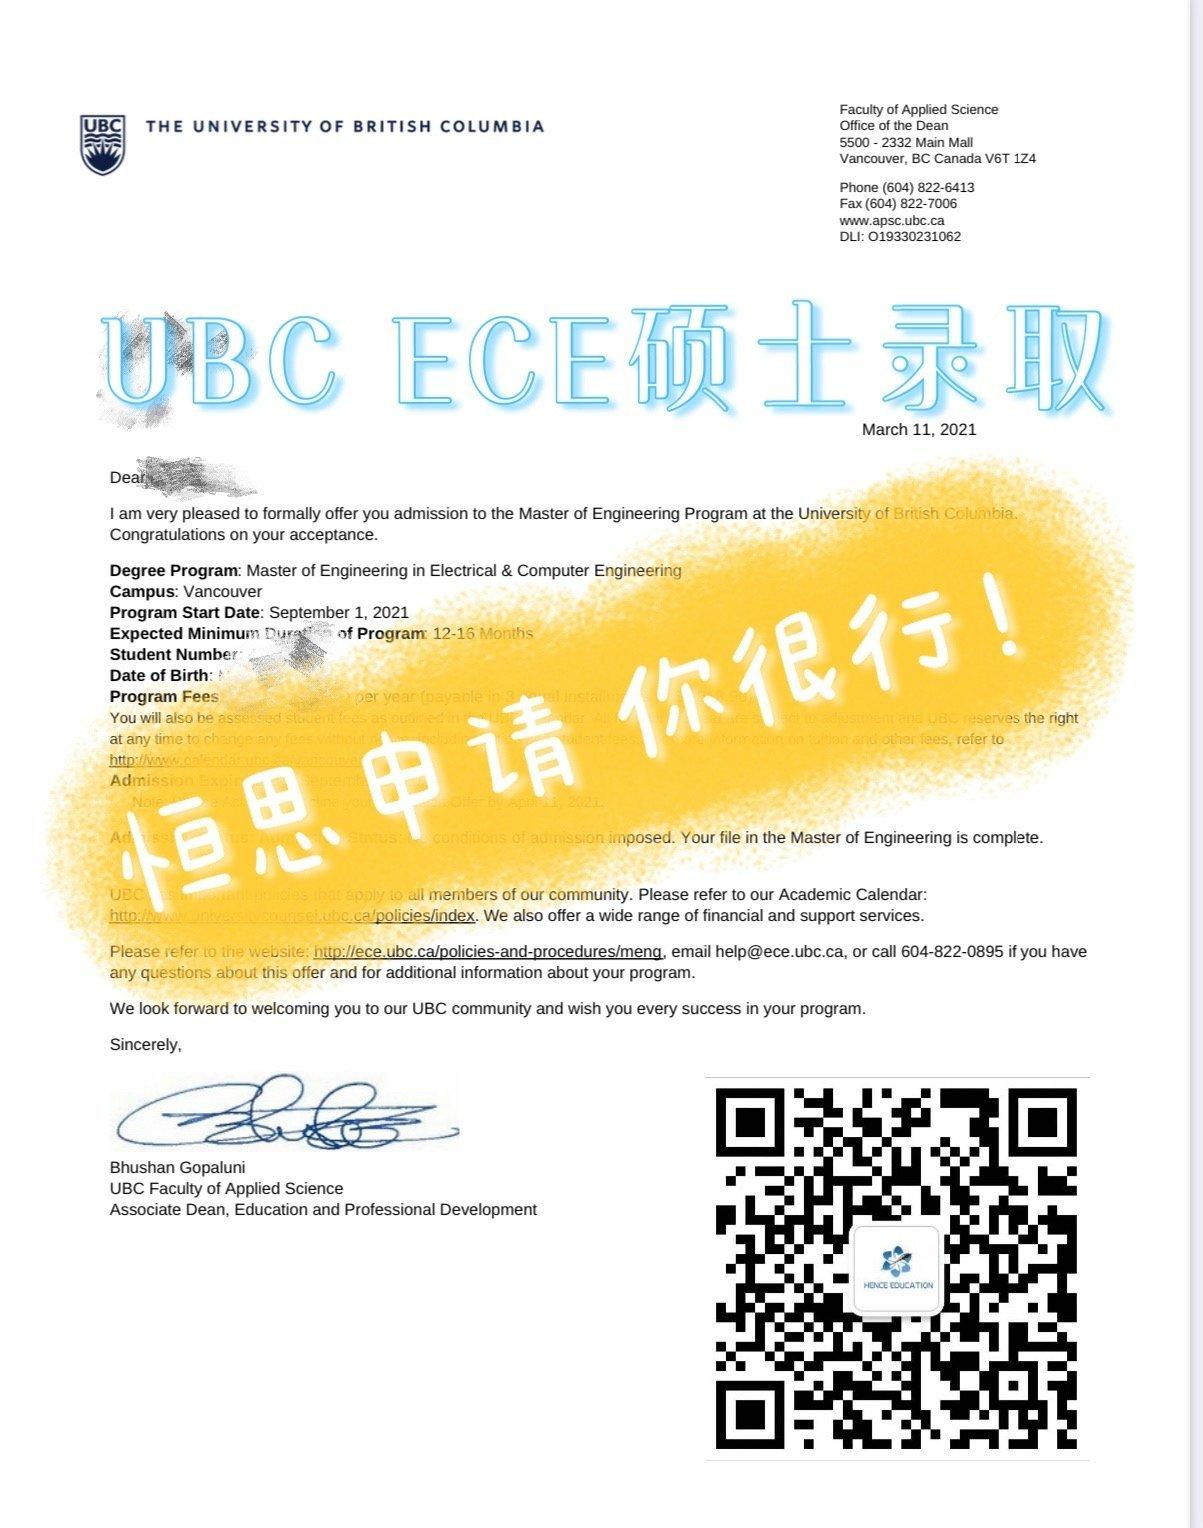 UBC工程系ECE硕士录取